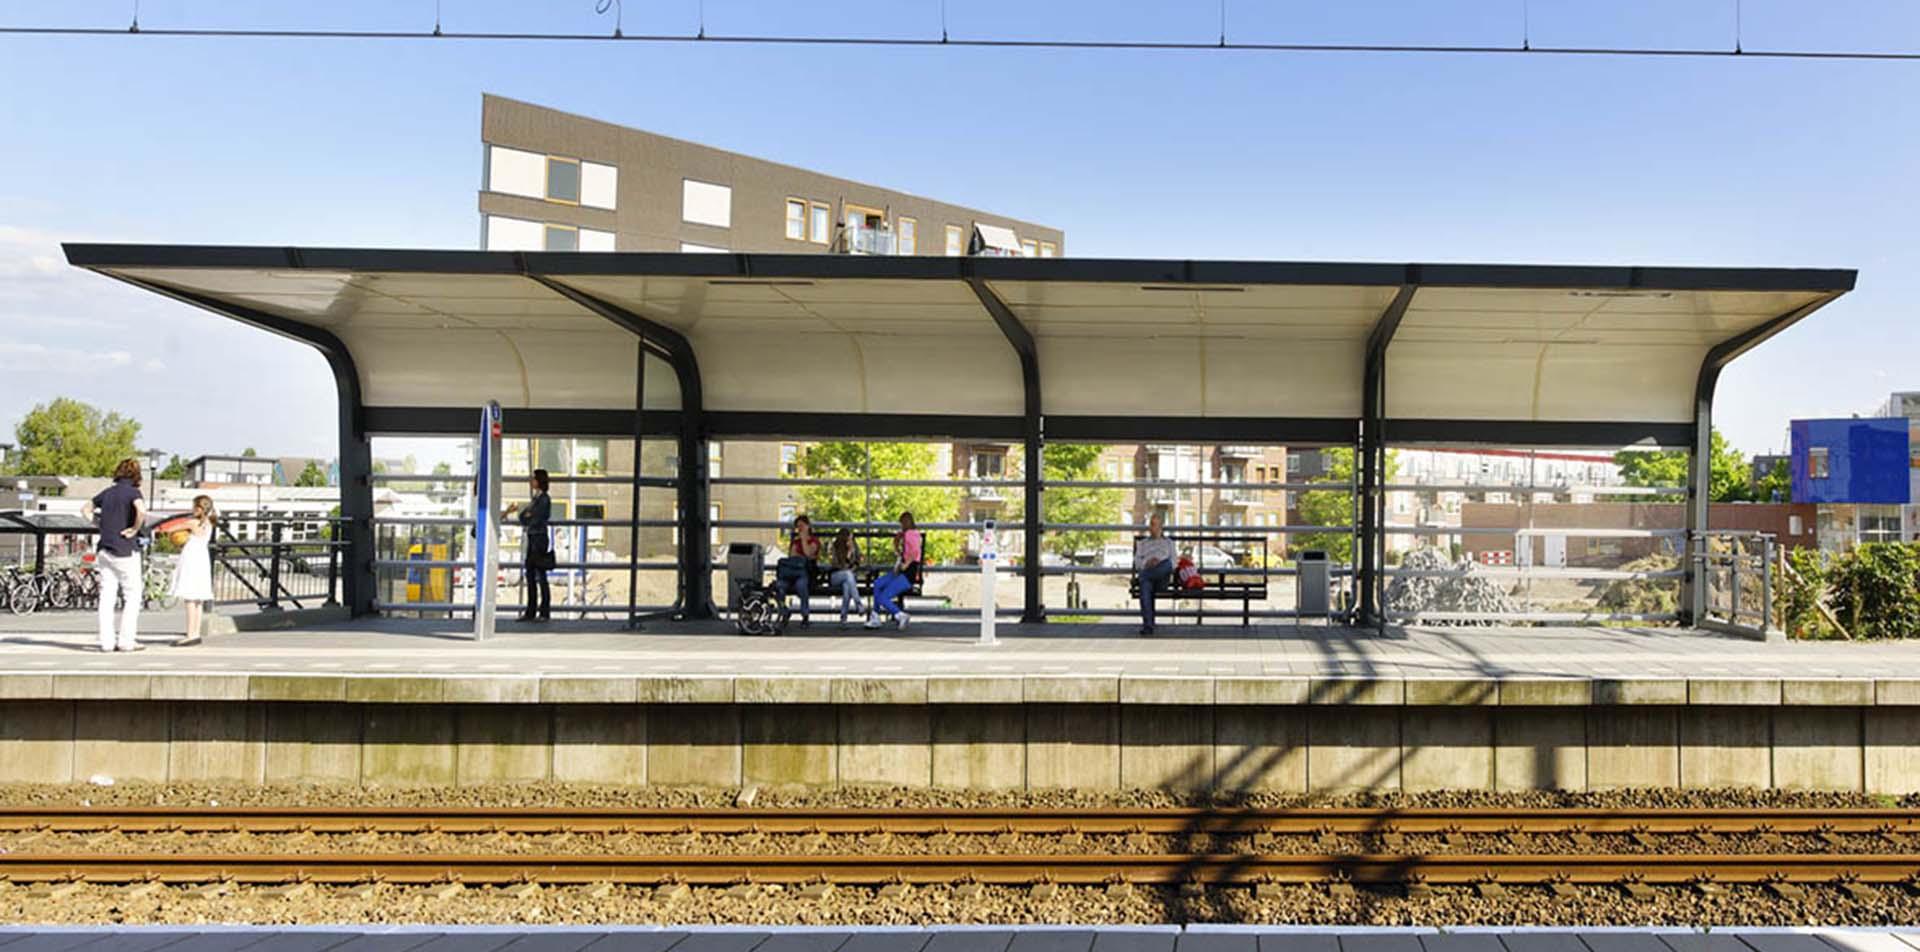 station Apeldoorn Osseveld